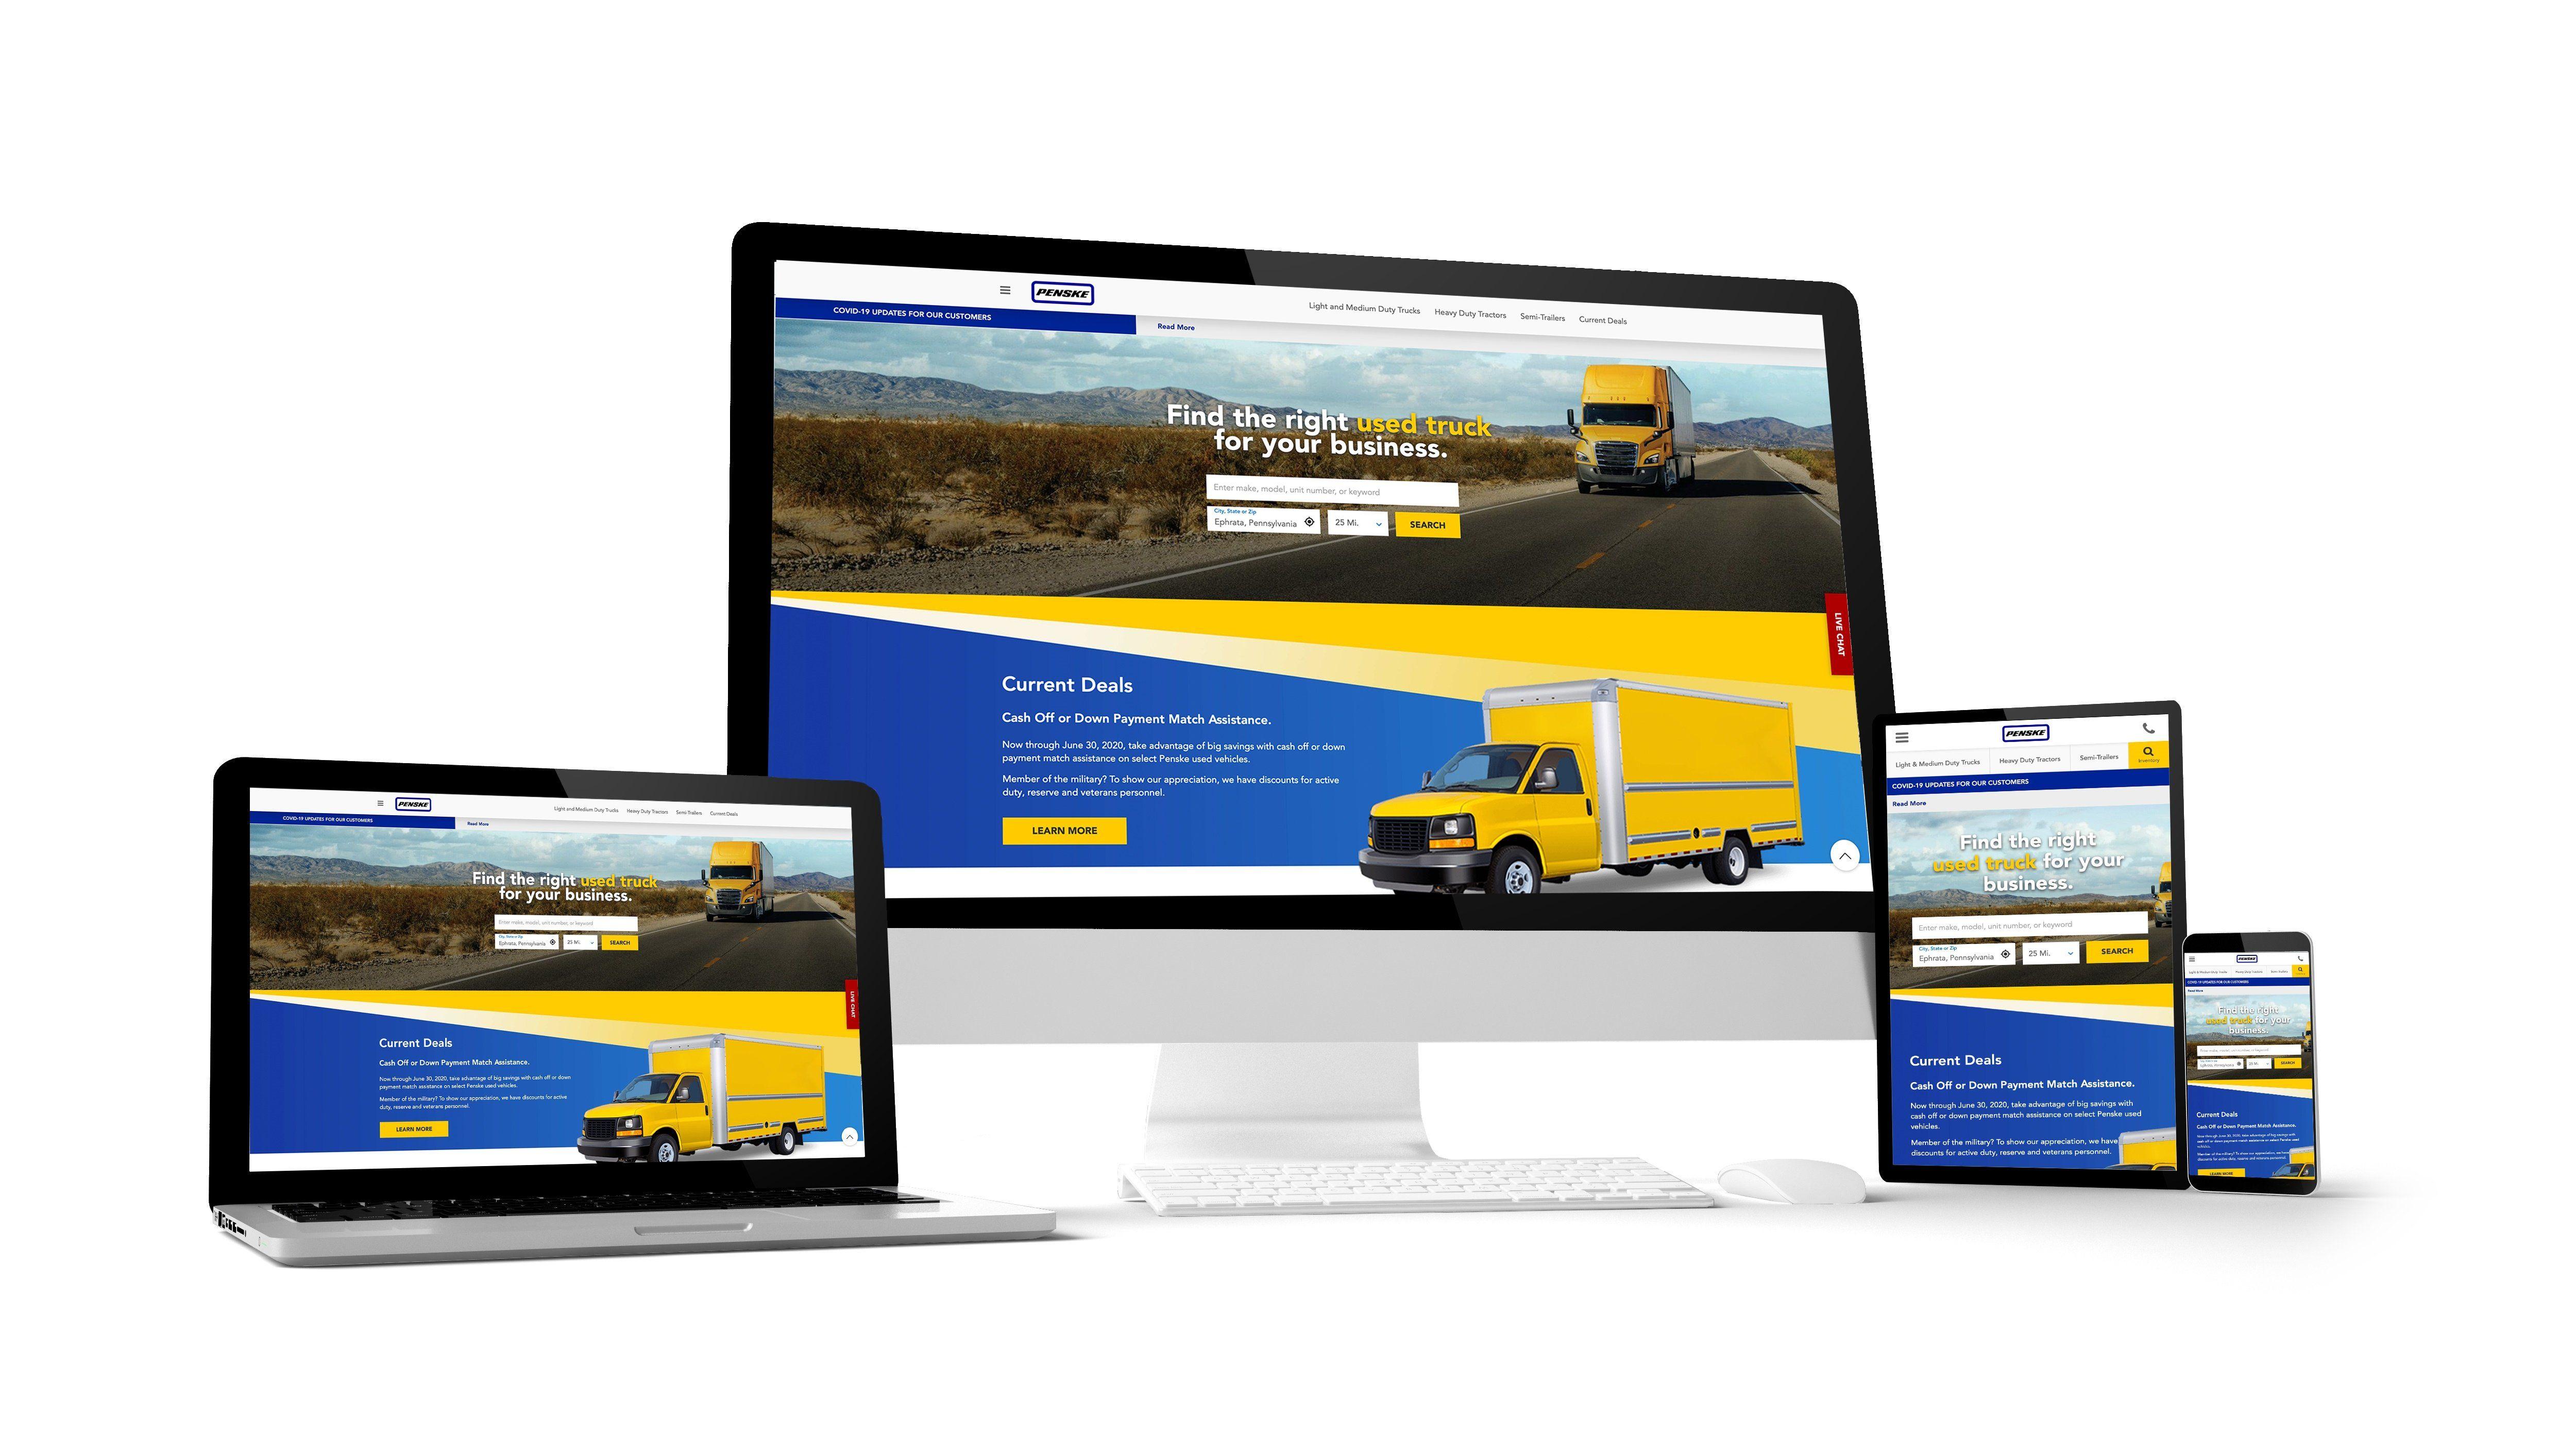 penske used trucks website on different devices